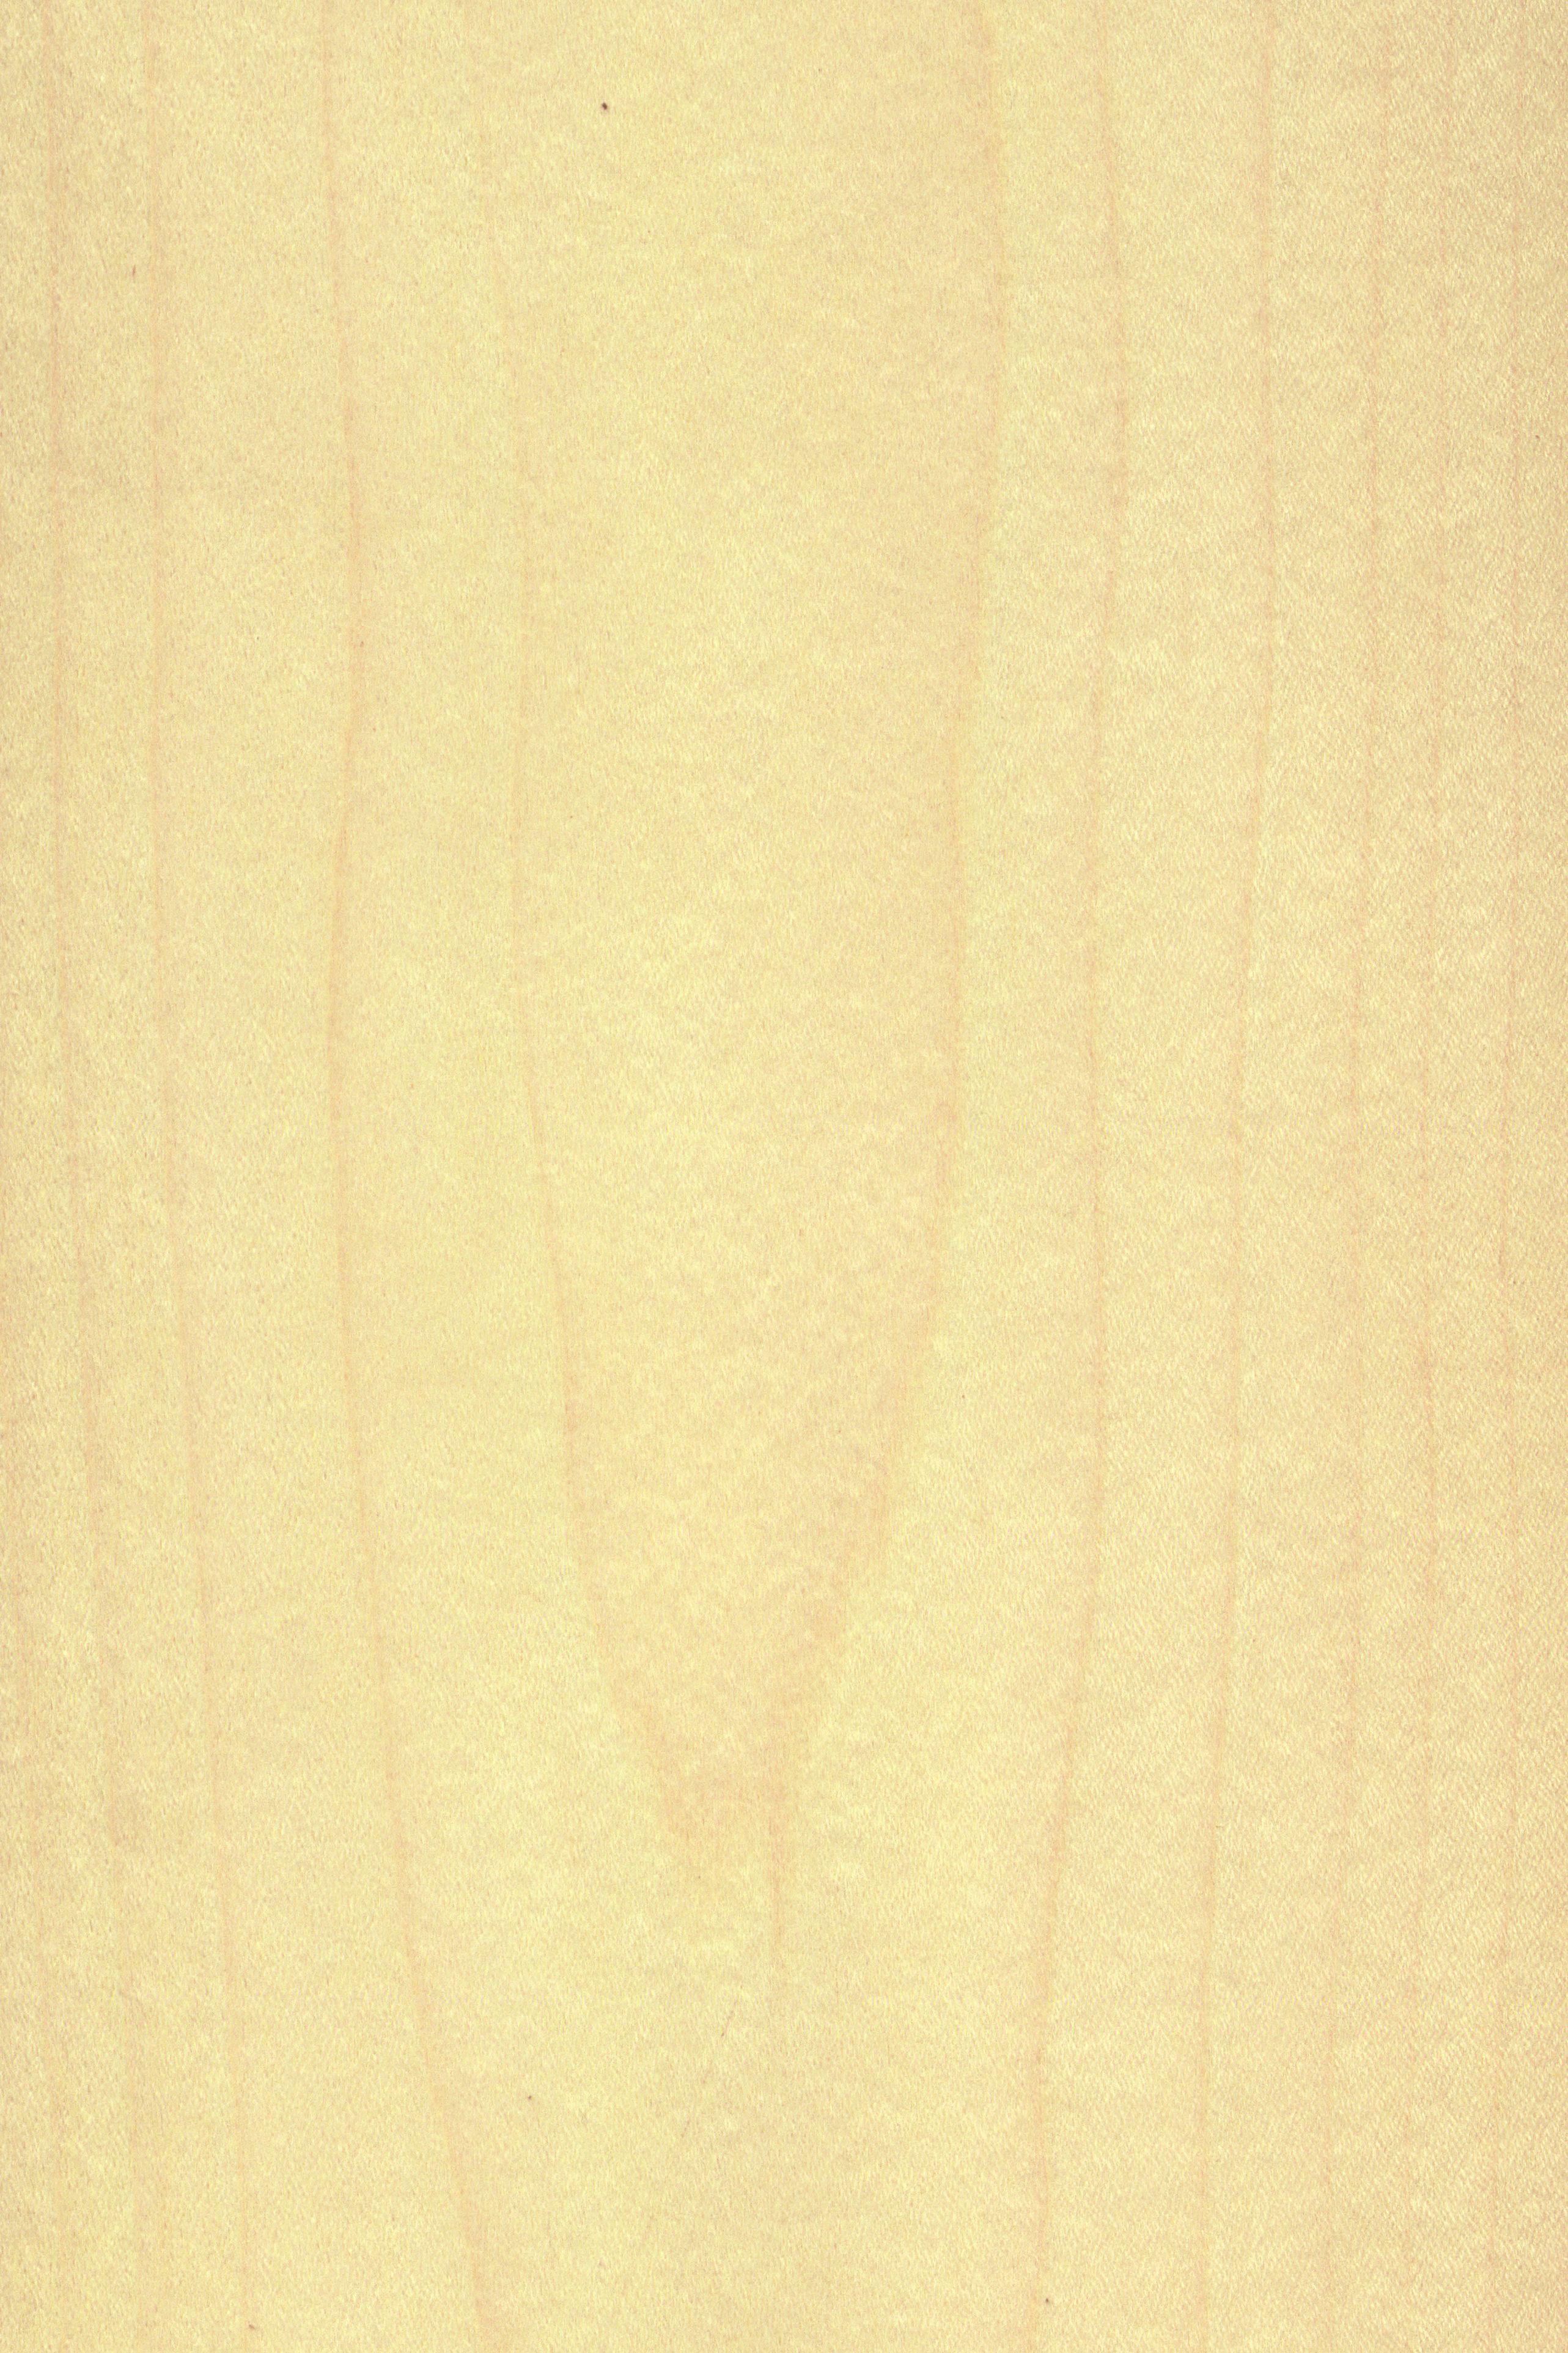 braun holz simple fliesen holzoptik weiss style kamin in design porzellan peronda foresta brand. Black Bedroom Furniture Sets. Home Design Ideas